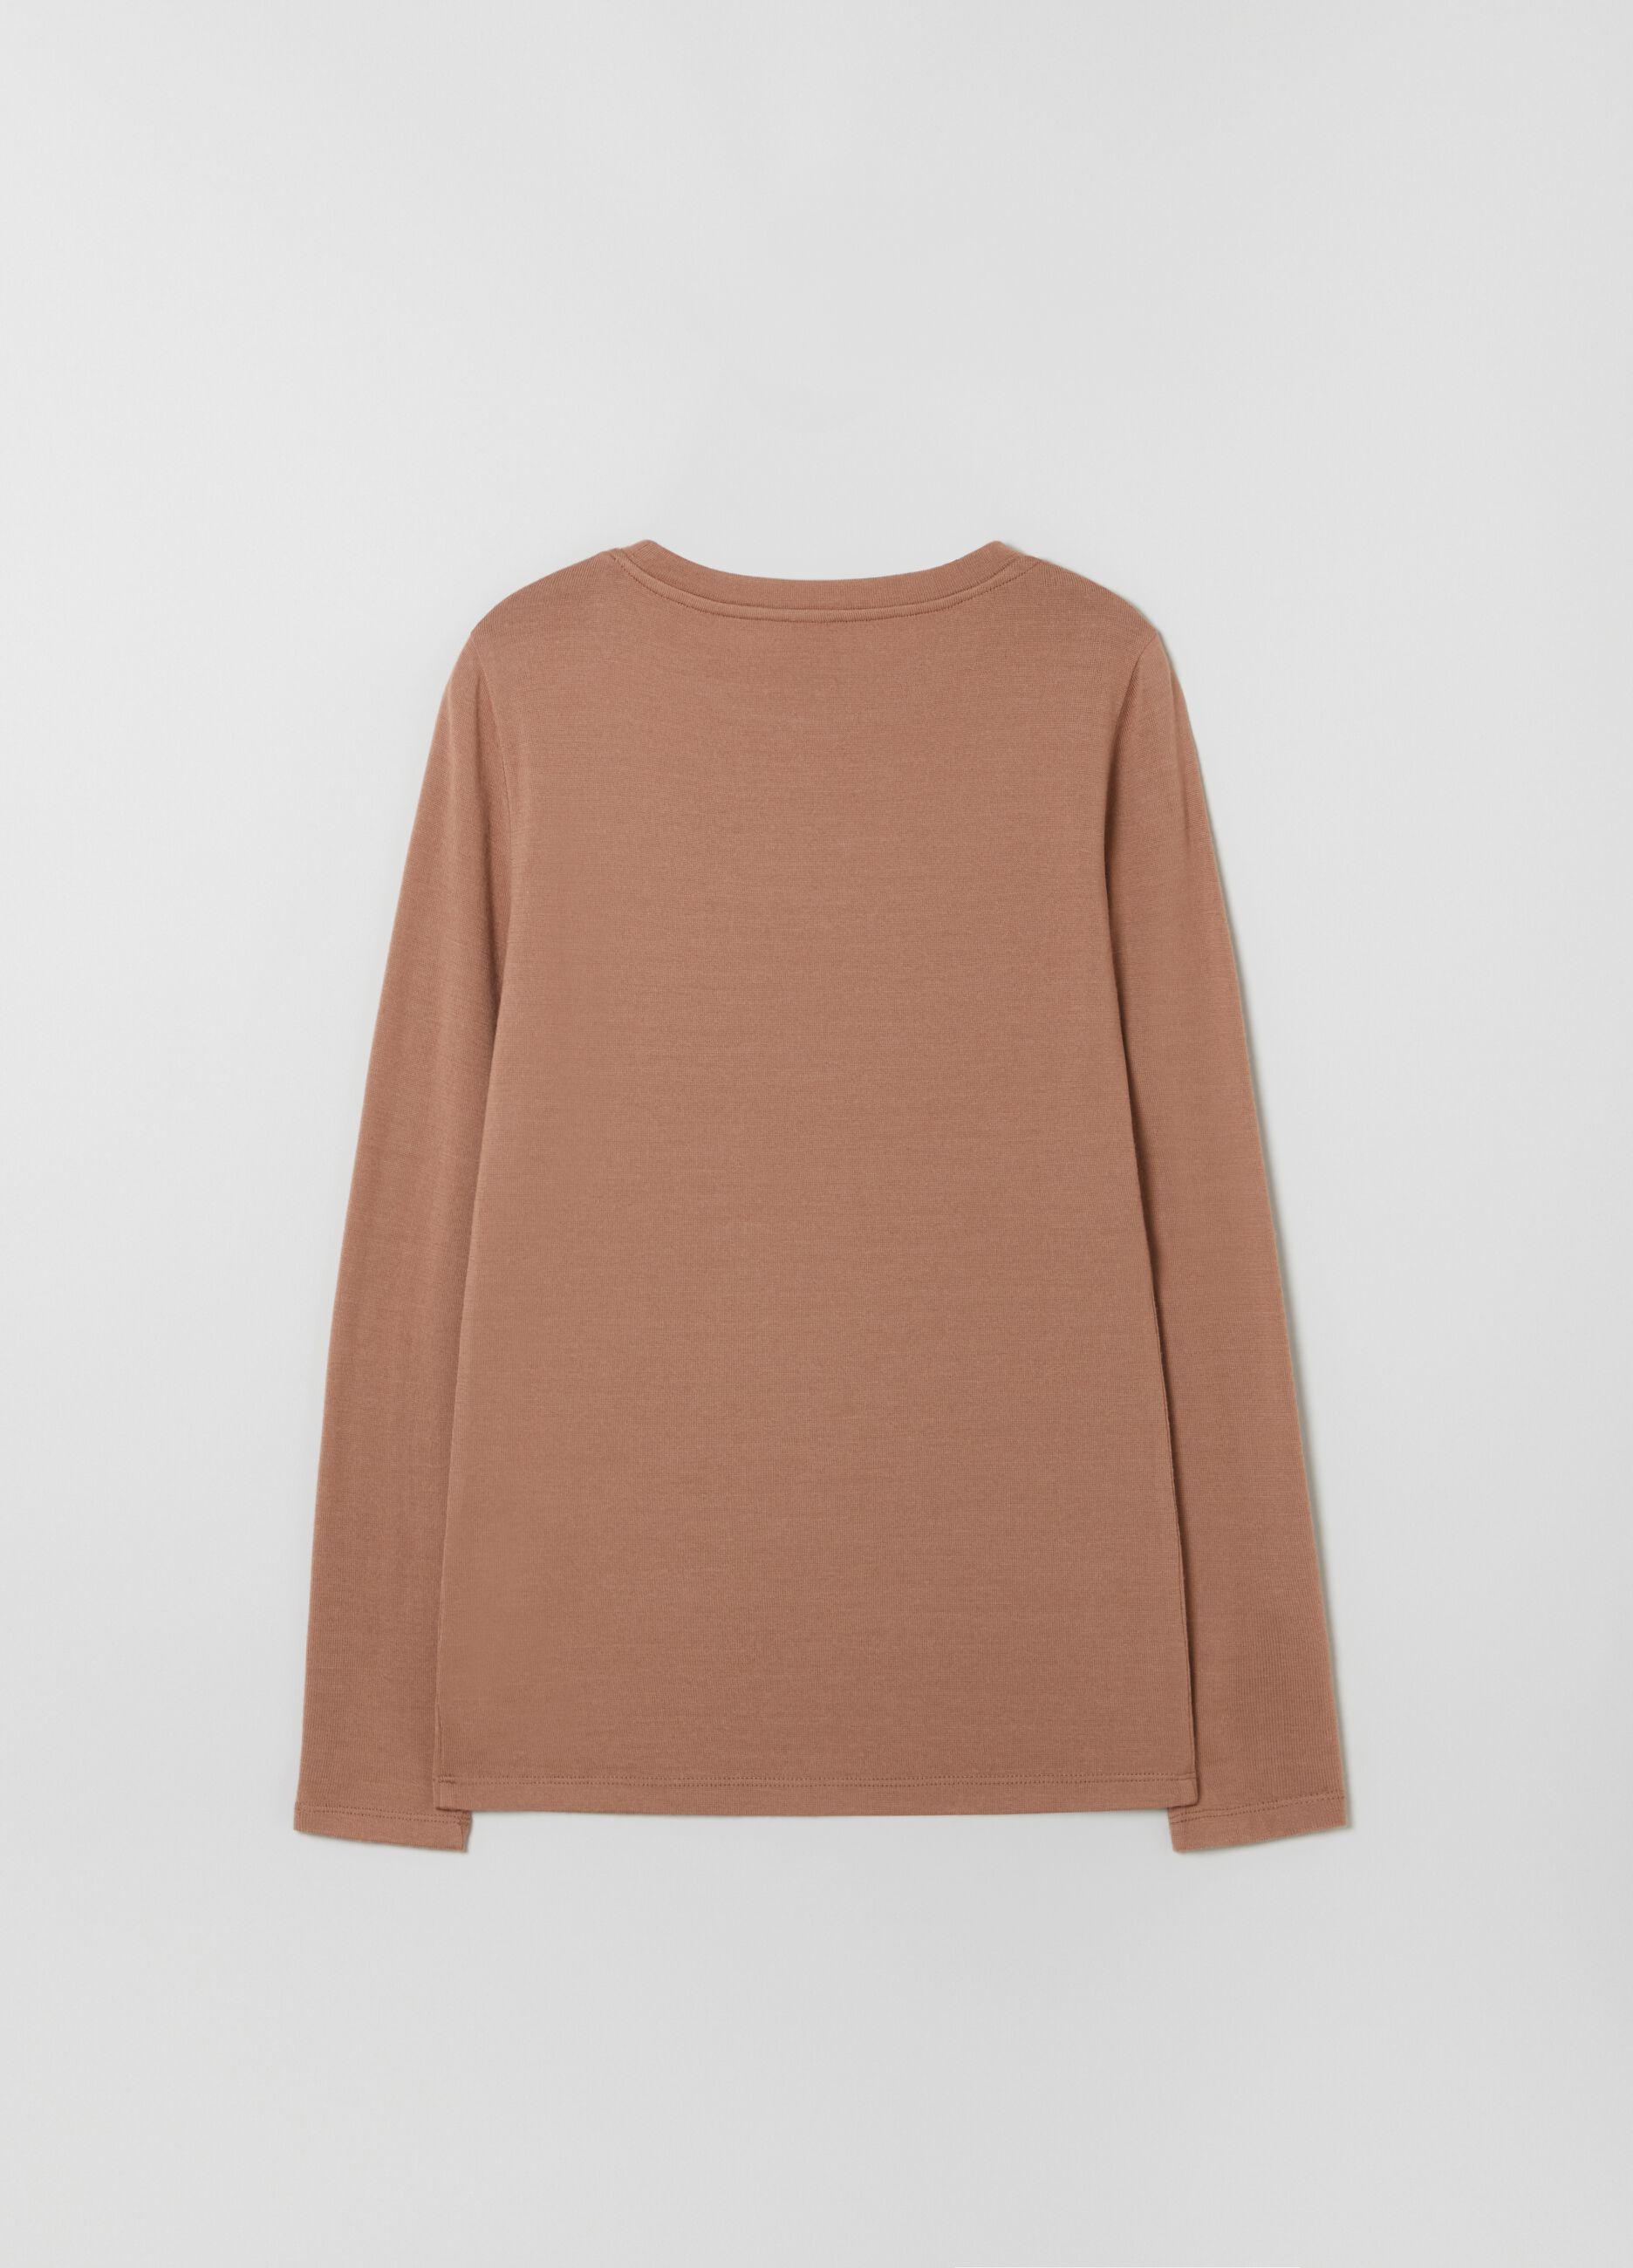 T-shirt girocollo in pura lana Marrone